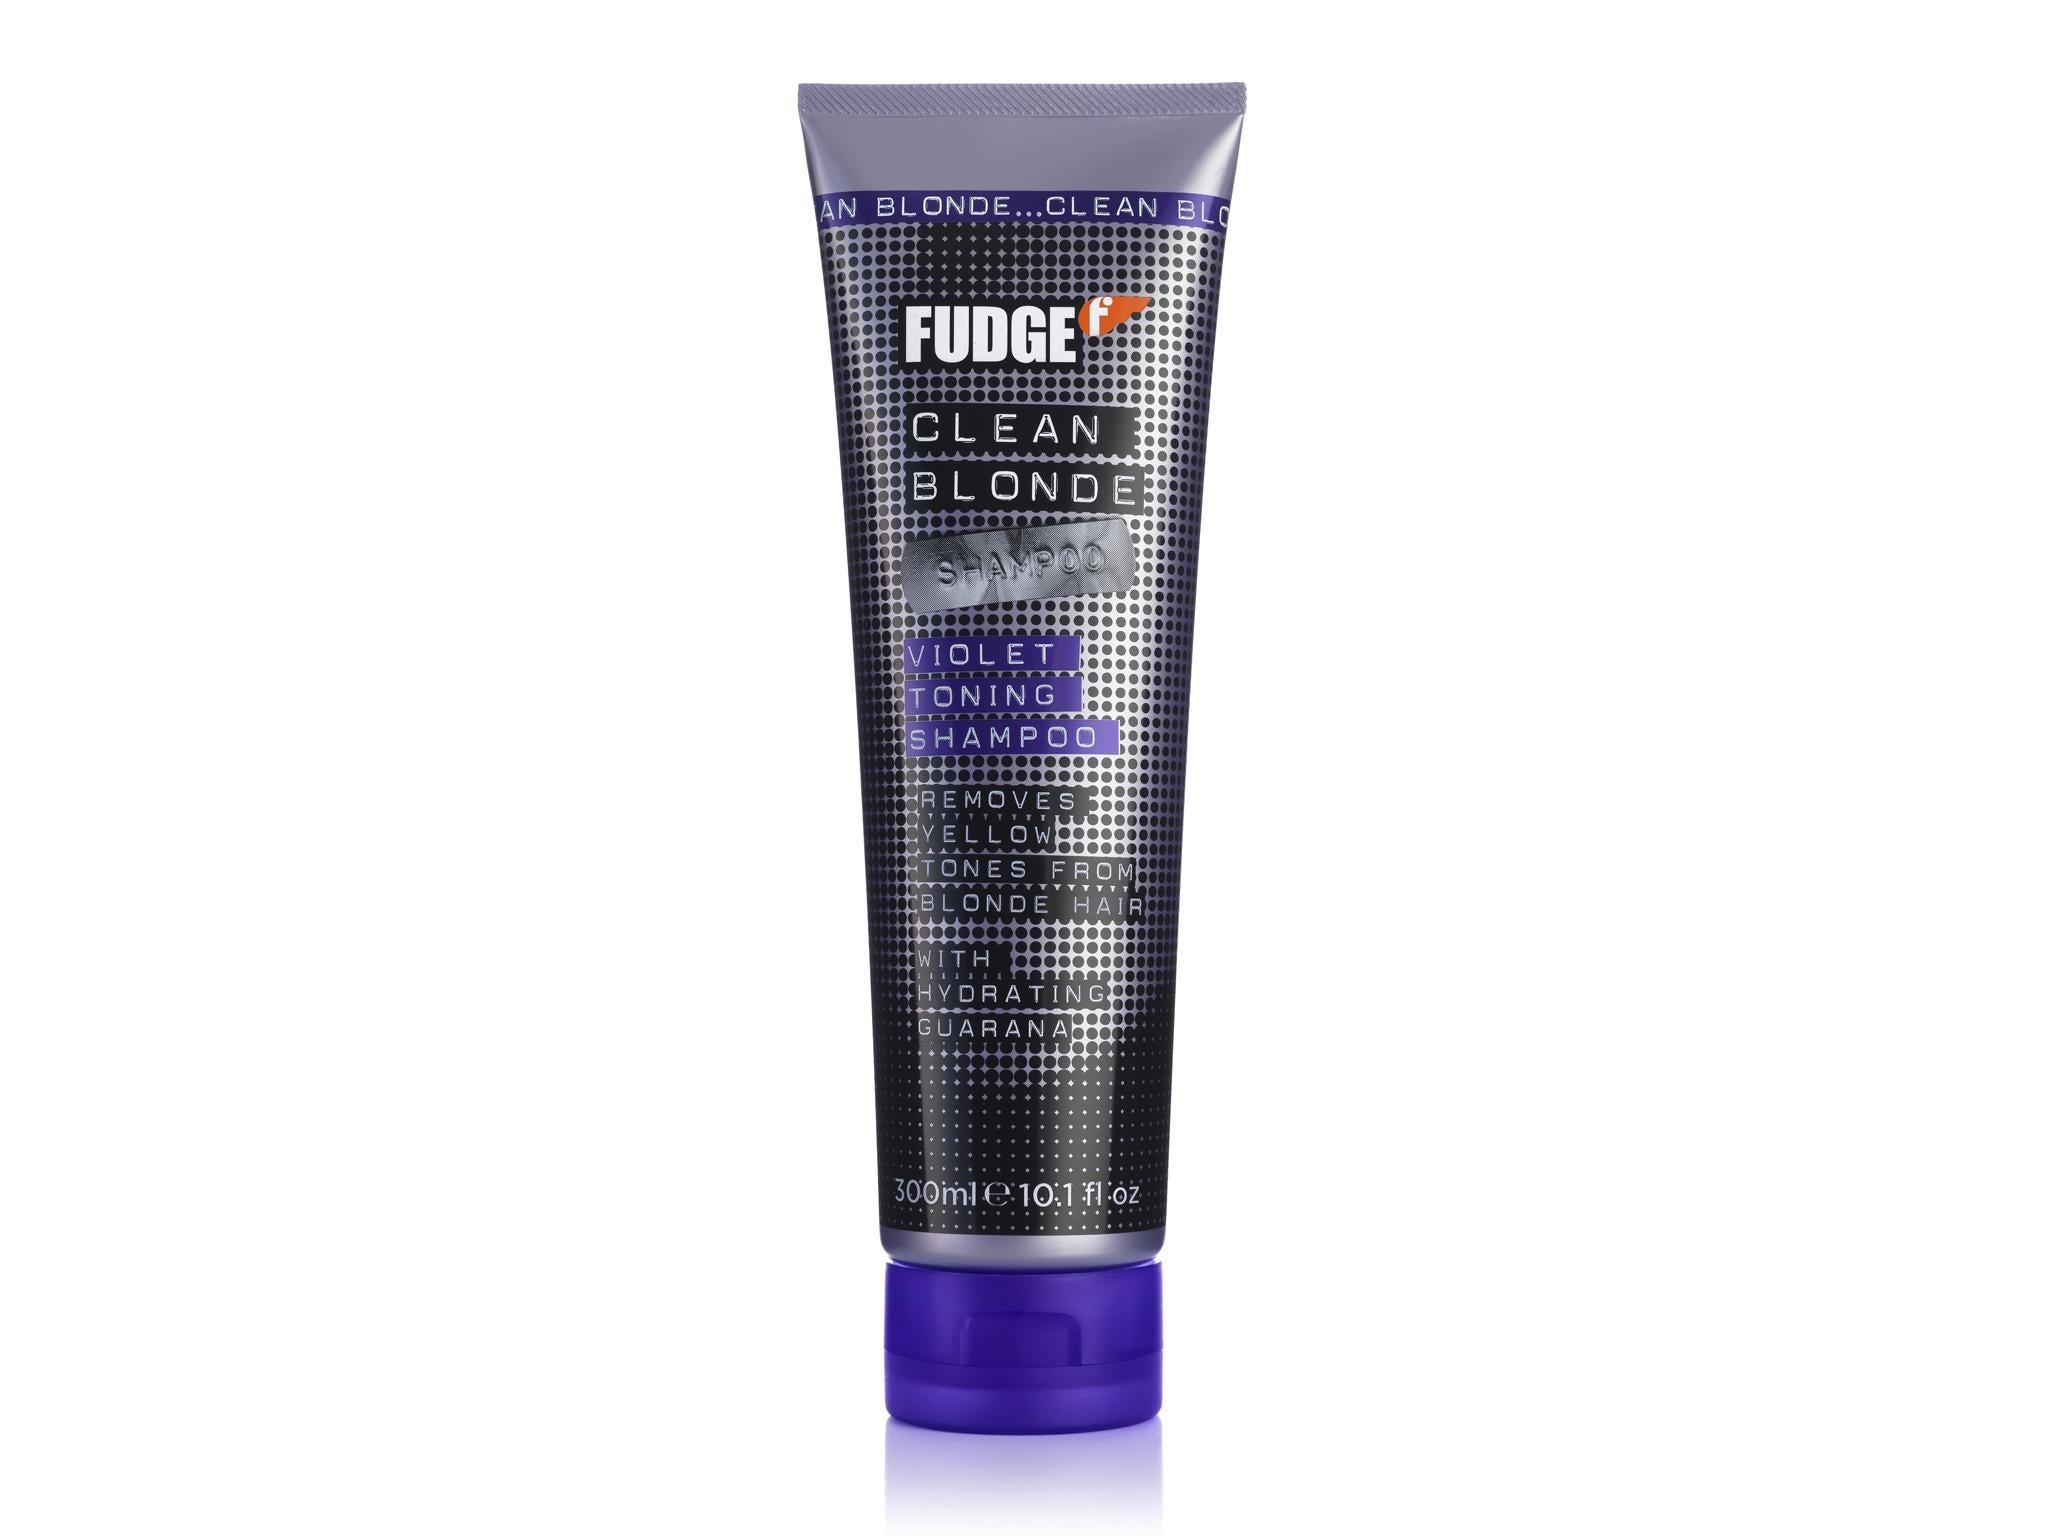 aac7152da91 Fudge Professional Clean Blonde Violet Shampoo  £13.95